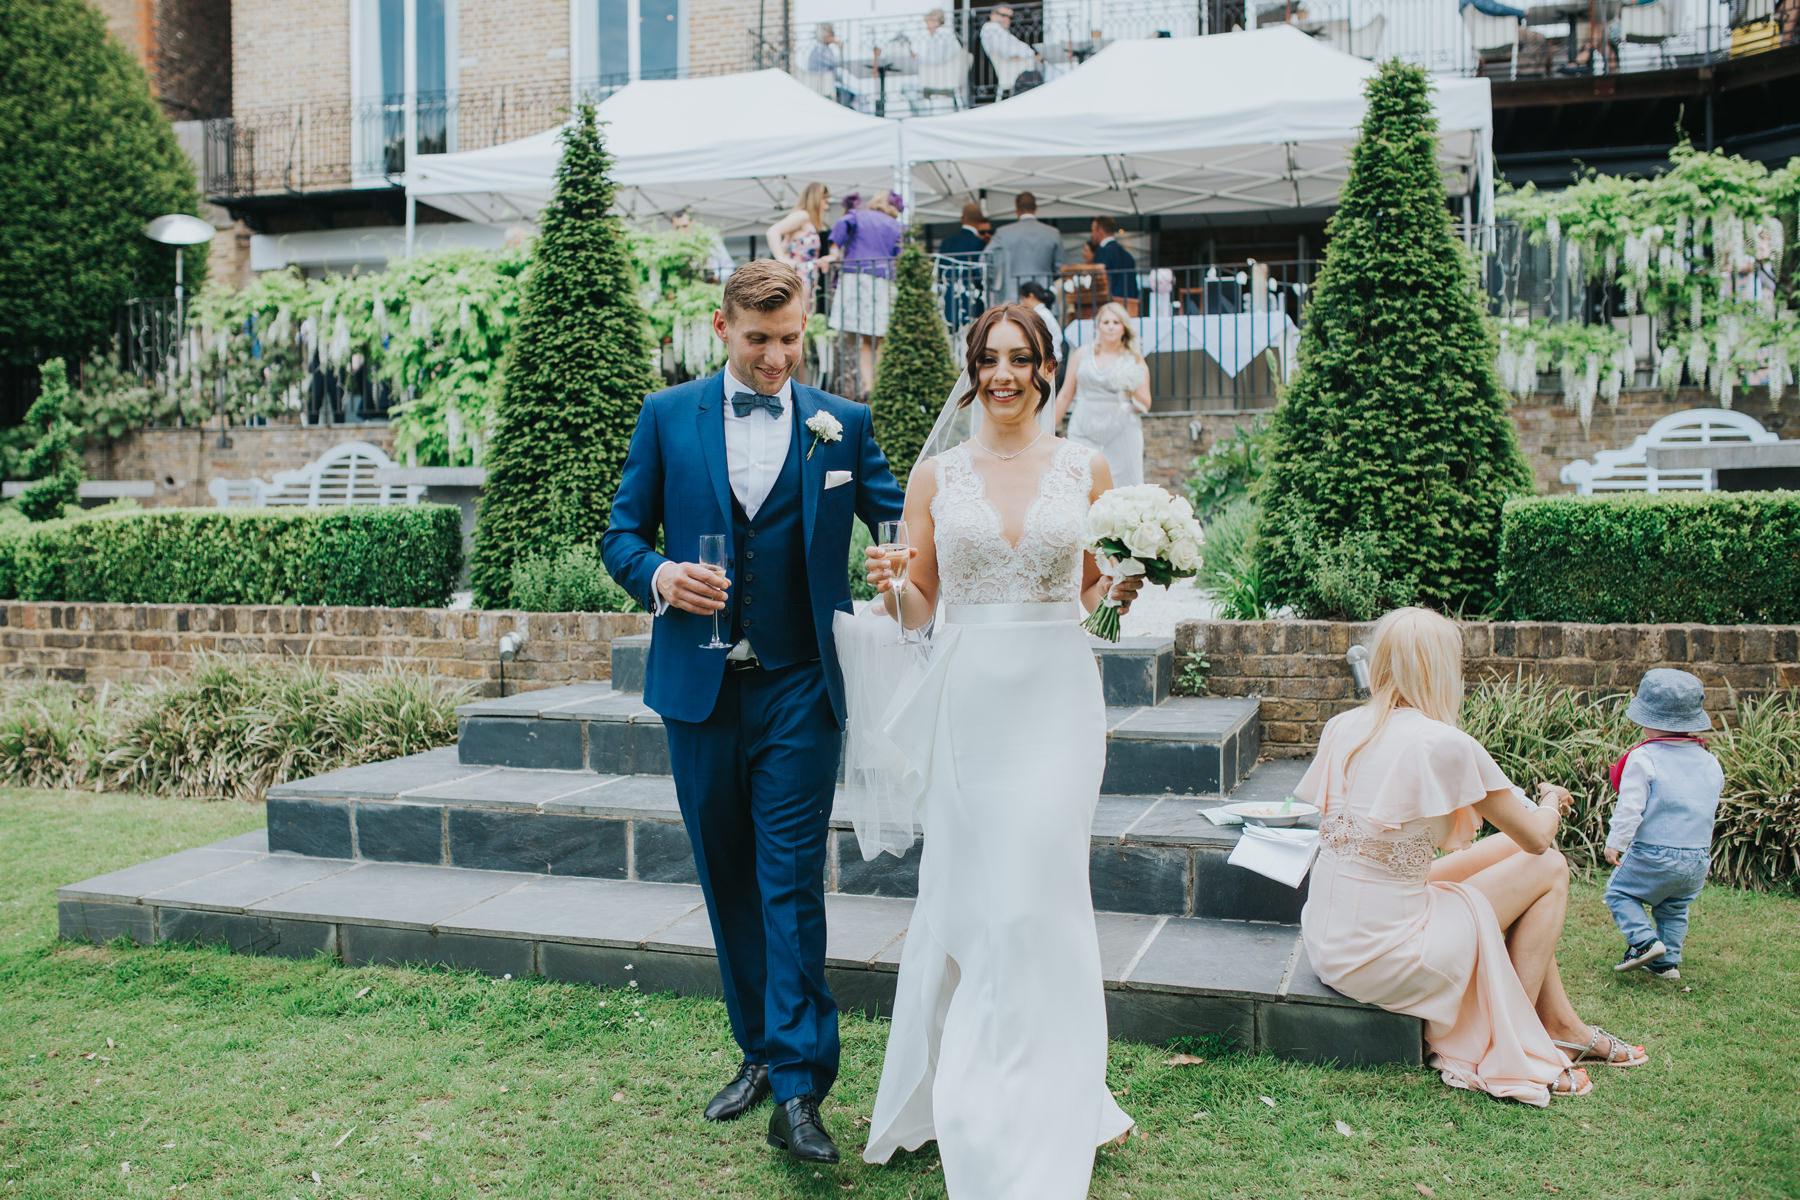 CRL-307-The Bingham wedding Richmond-Claire Rob bridal couple portraits.jpg